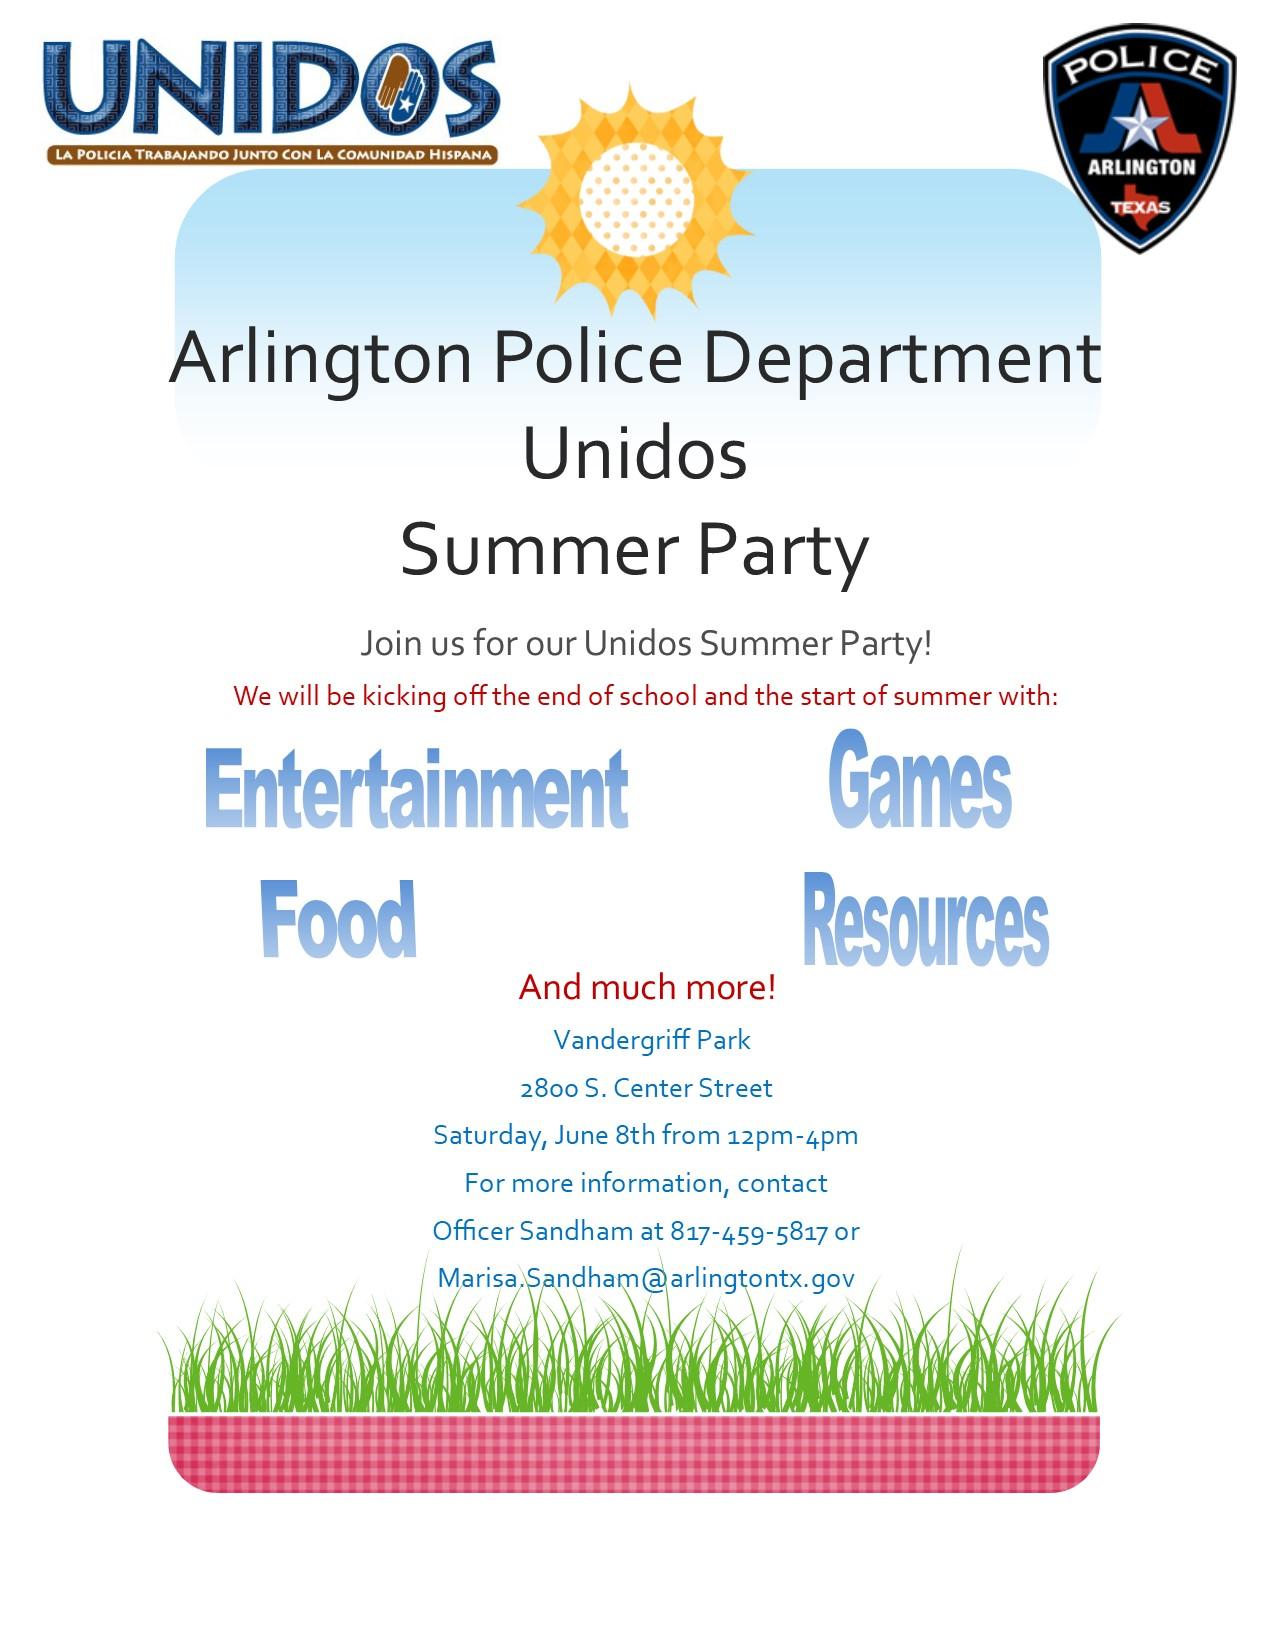 Arlington Police Dept UNIDOS Summer Party!